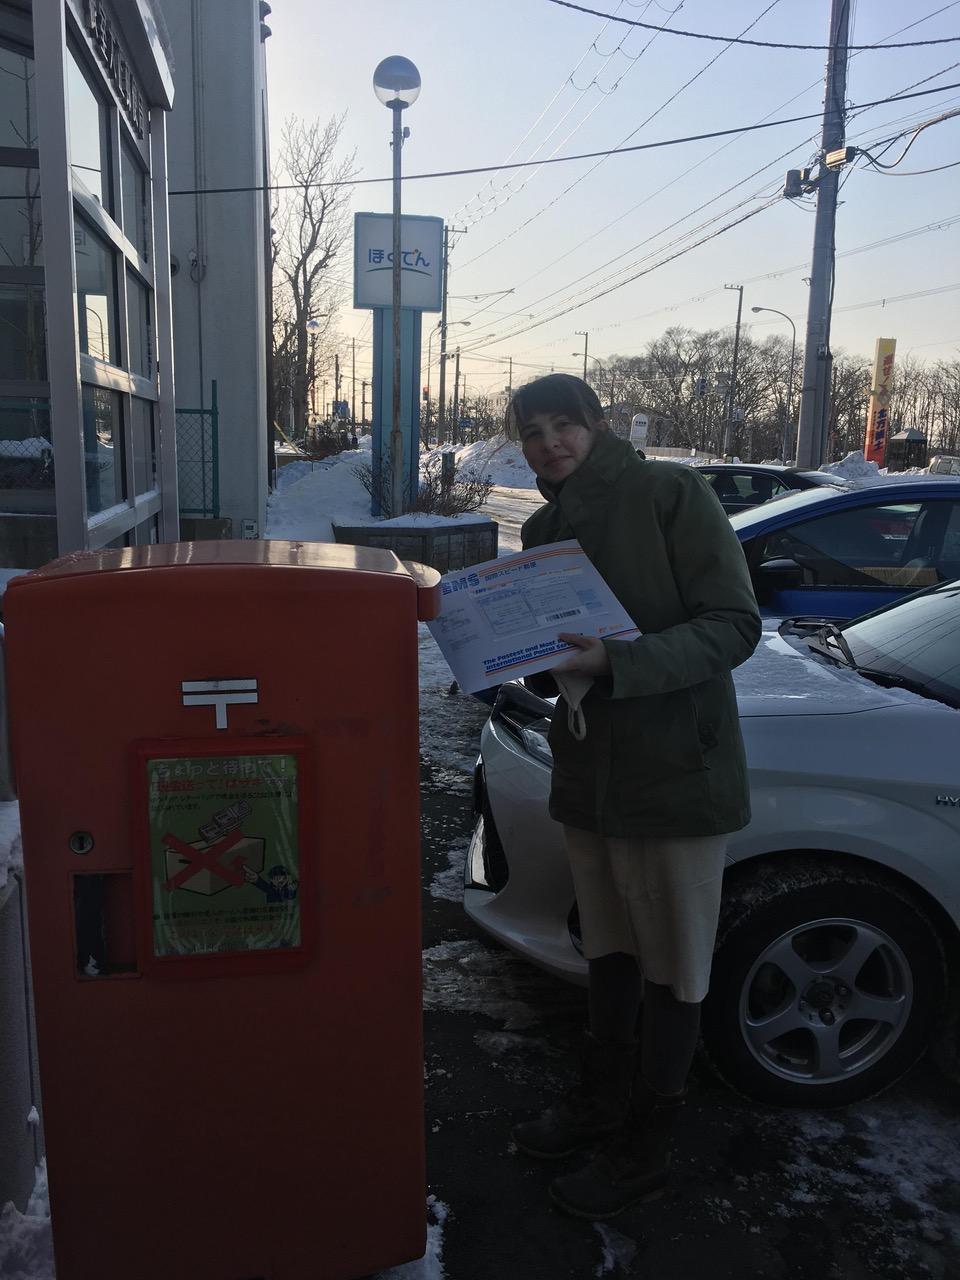 penpal project photo of me sending letters at mailbox